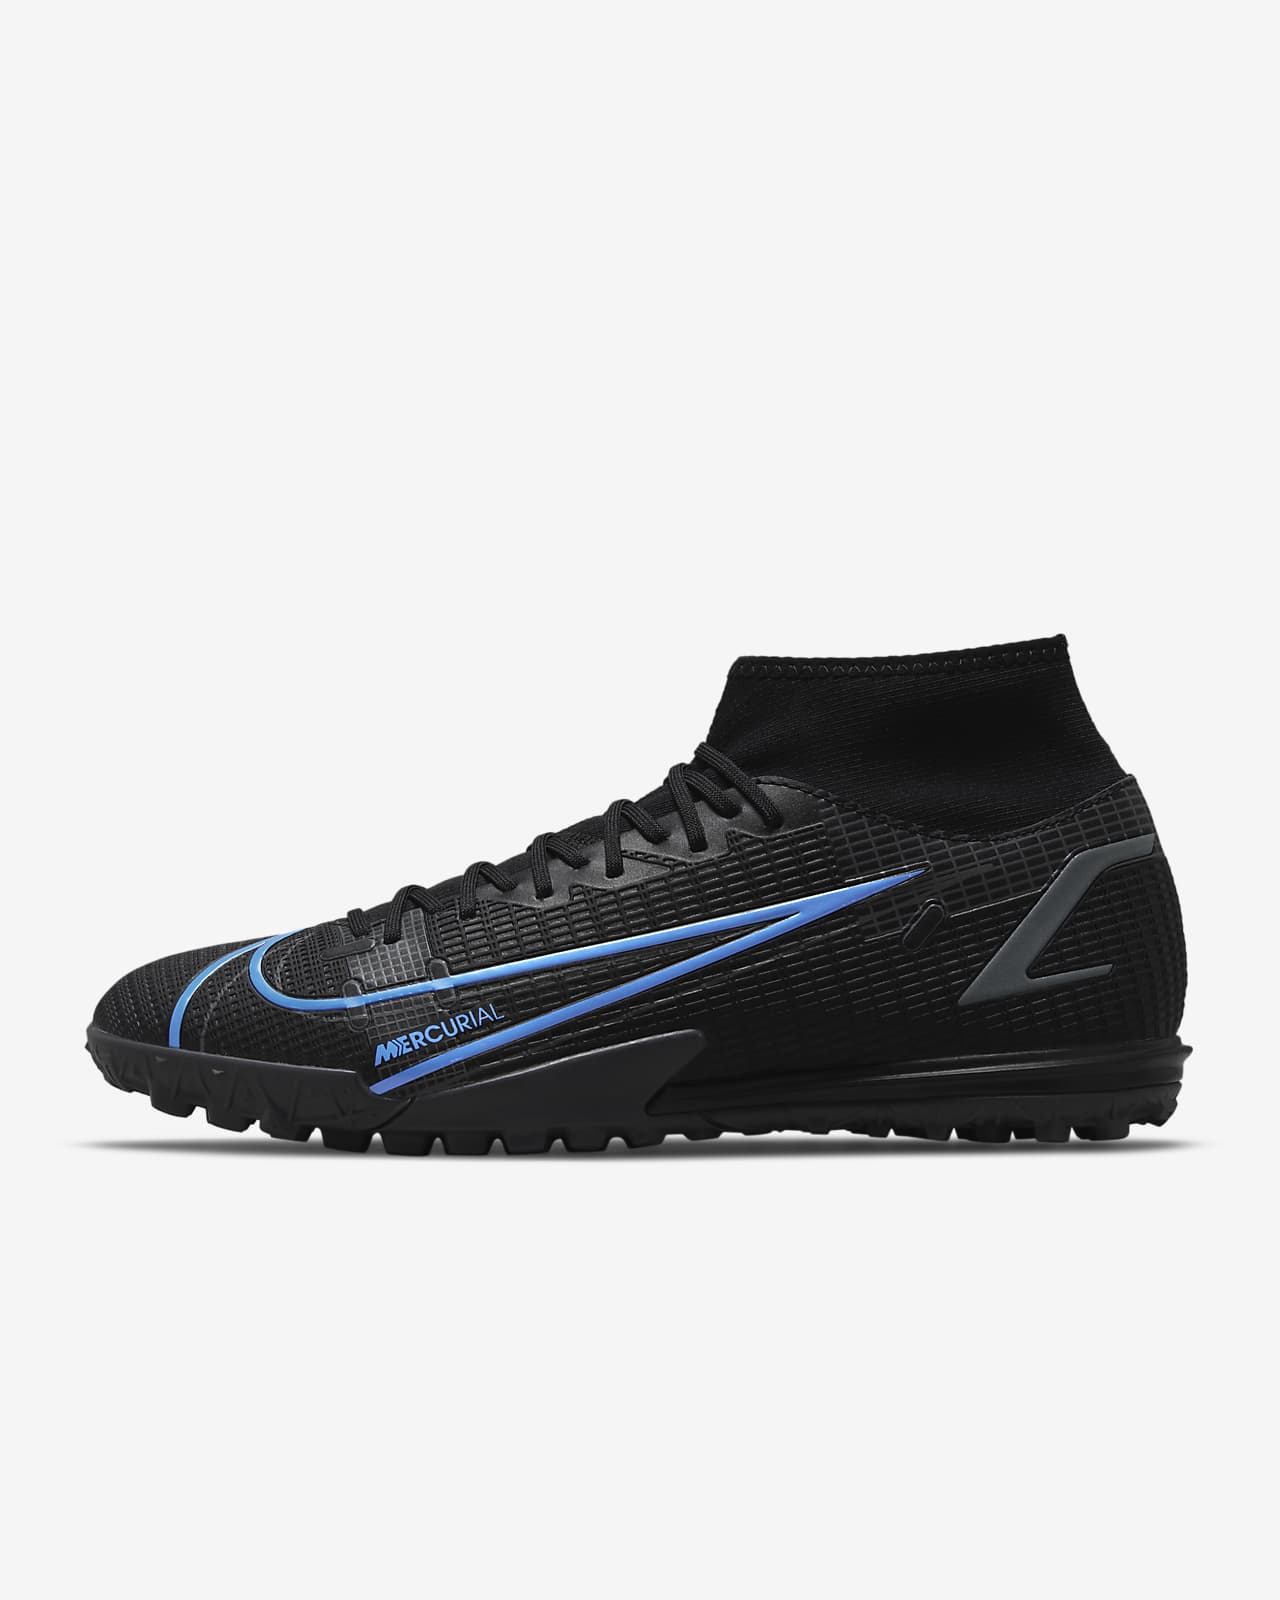 Nike Mercurial Superfly 8 Academy TF fotballsko til grus/turf